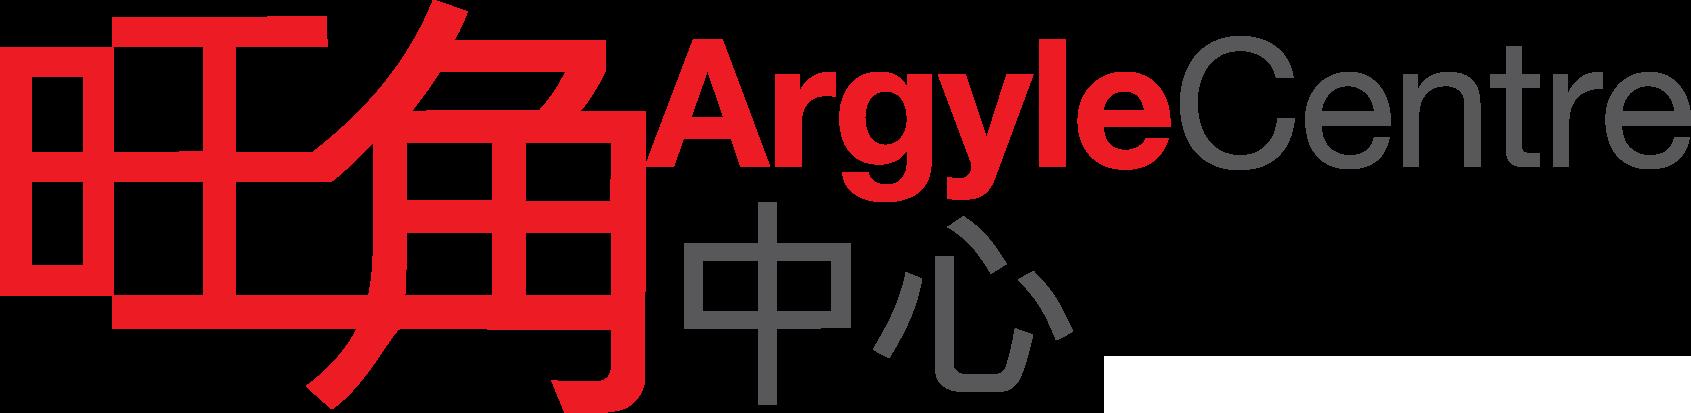 Argyle Centre